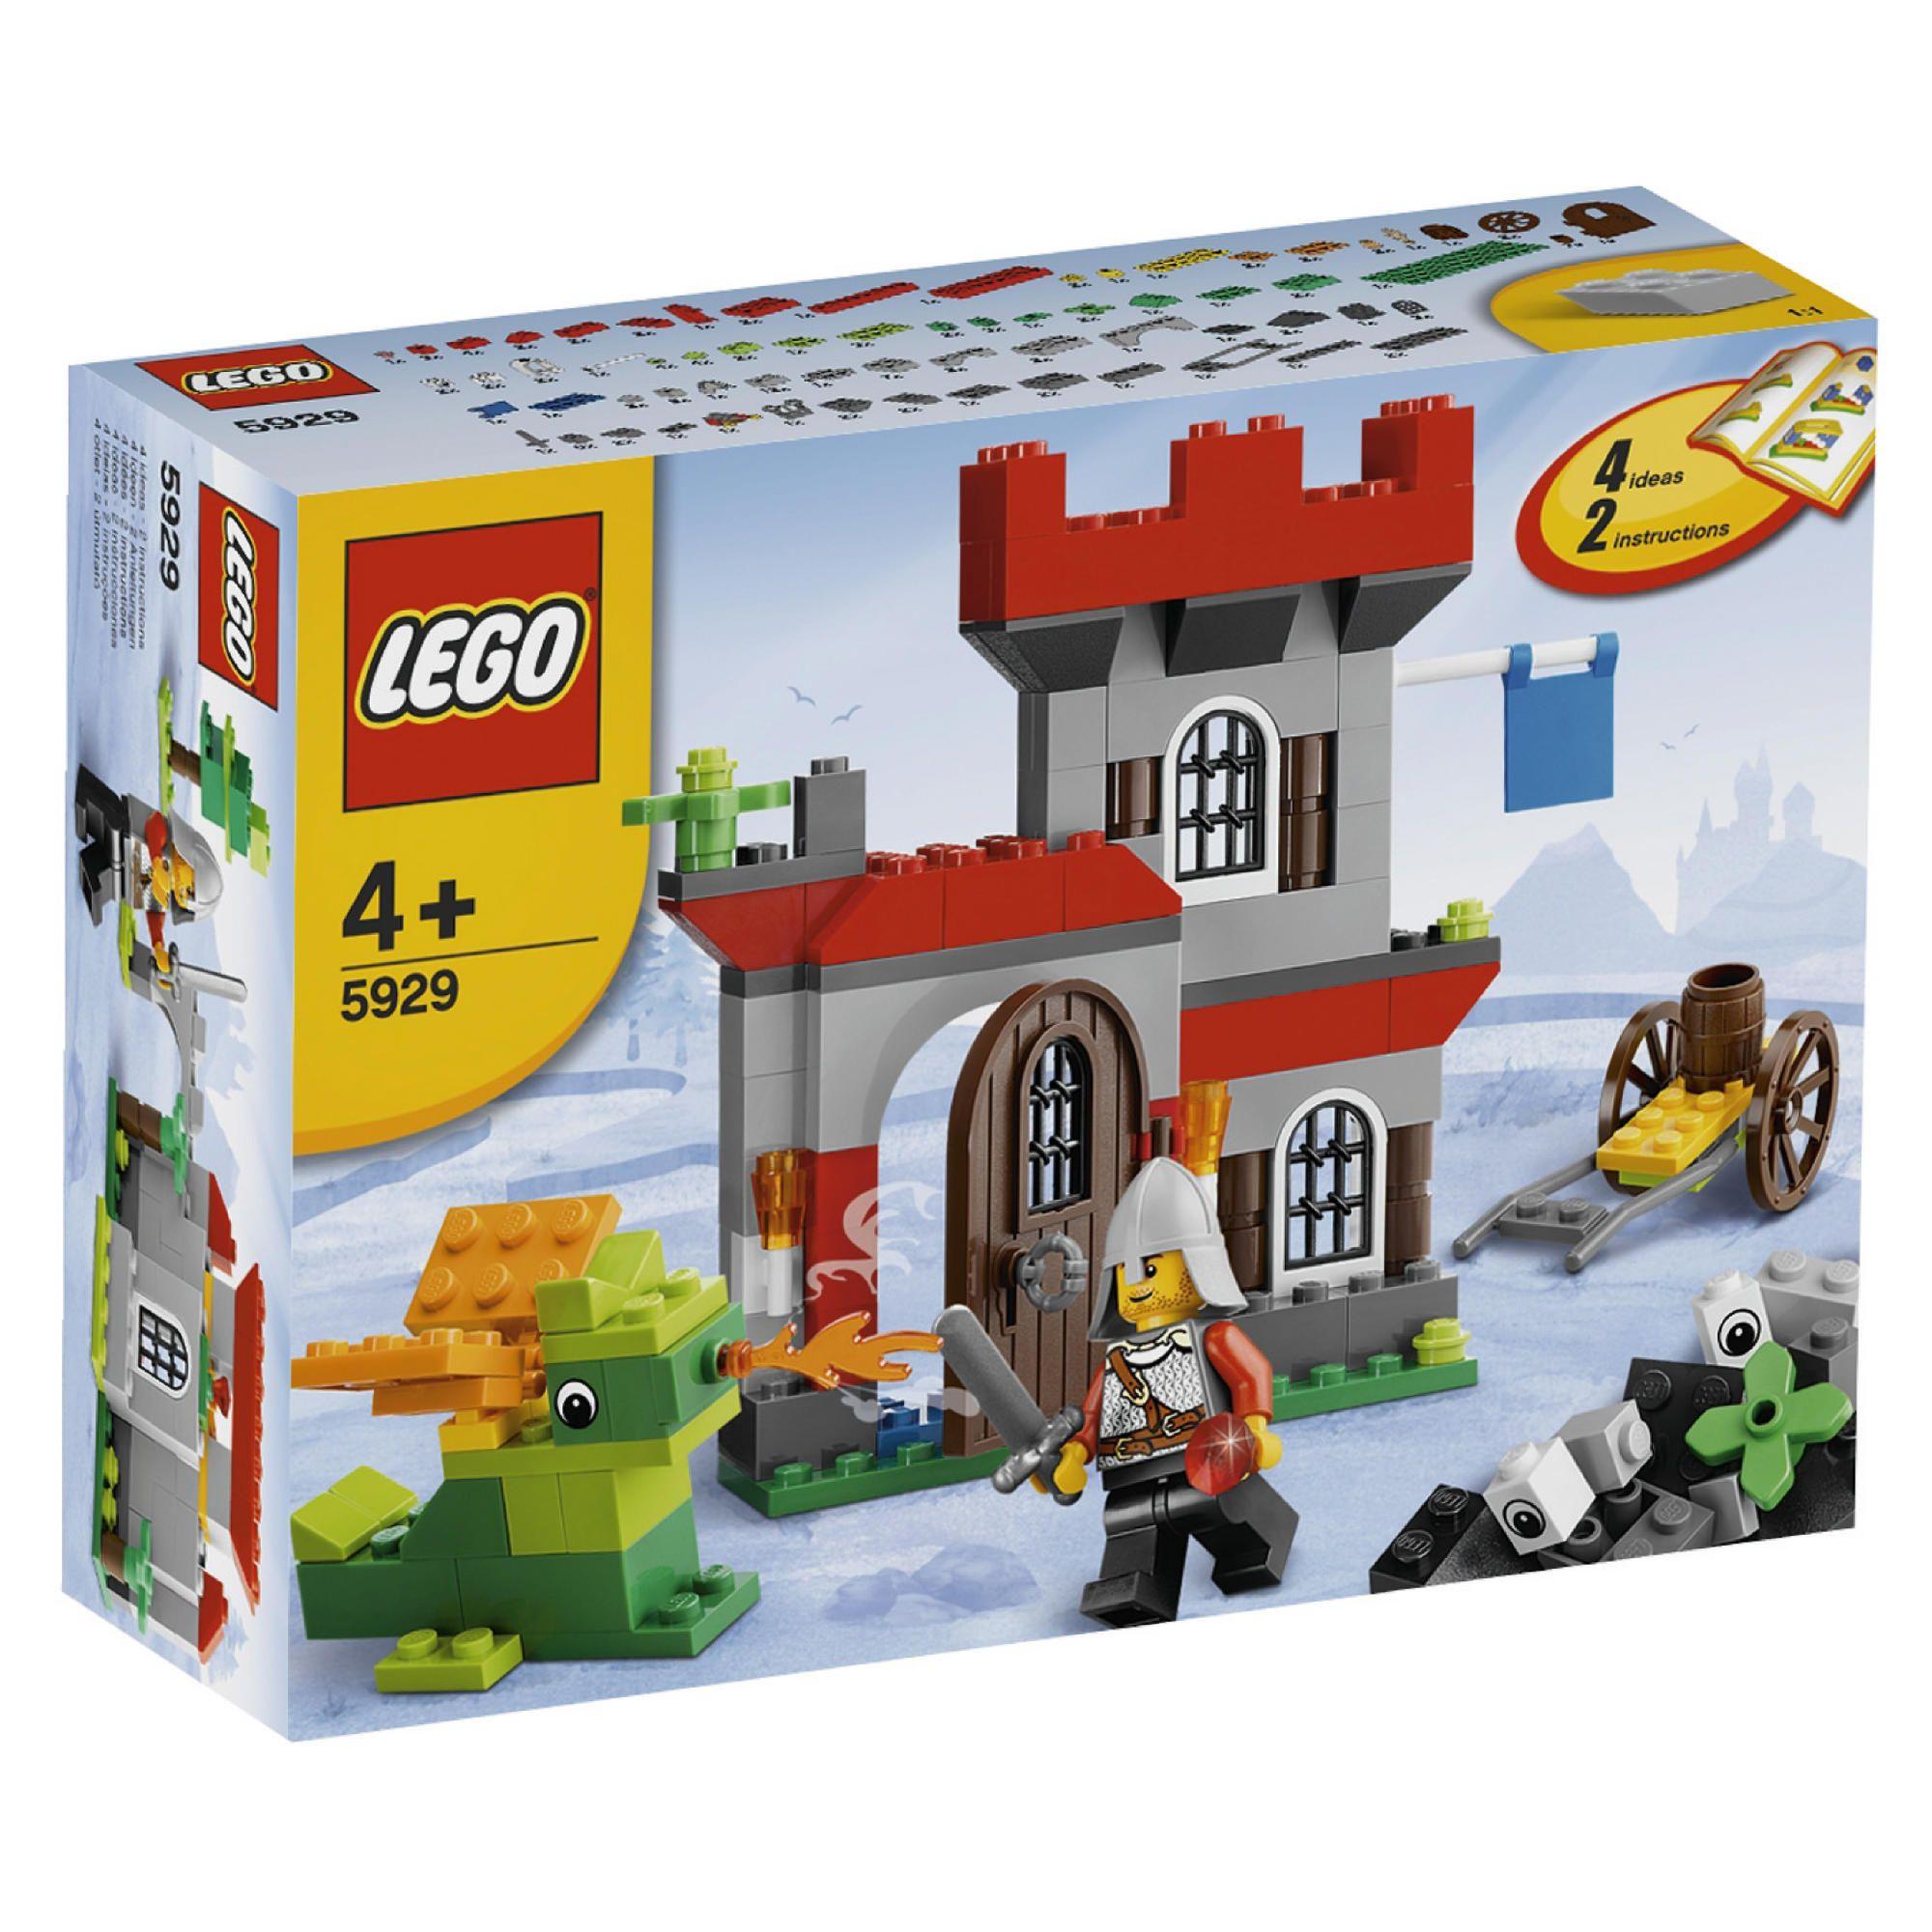 LEGO 5929 Brick&More